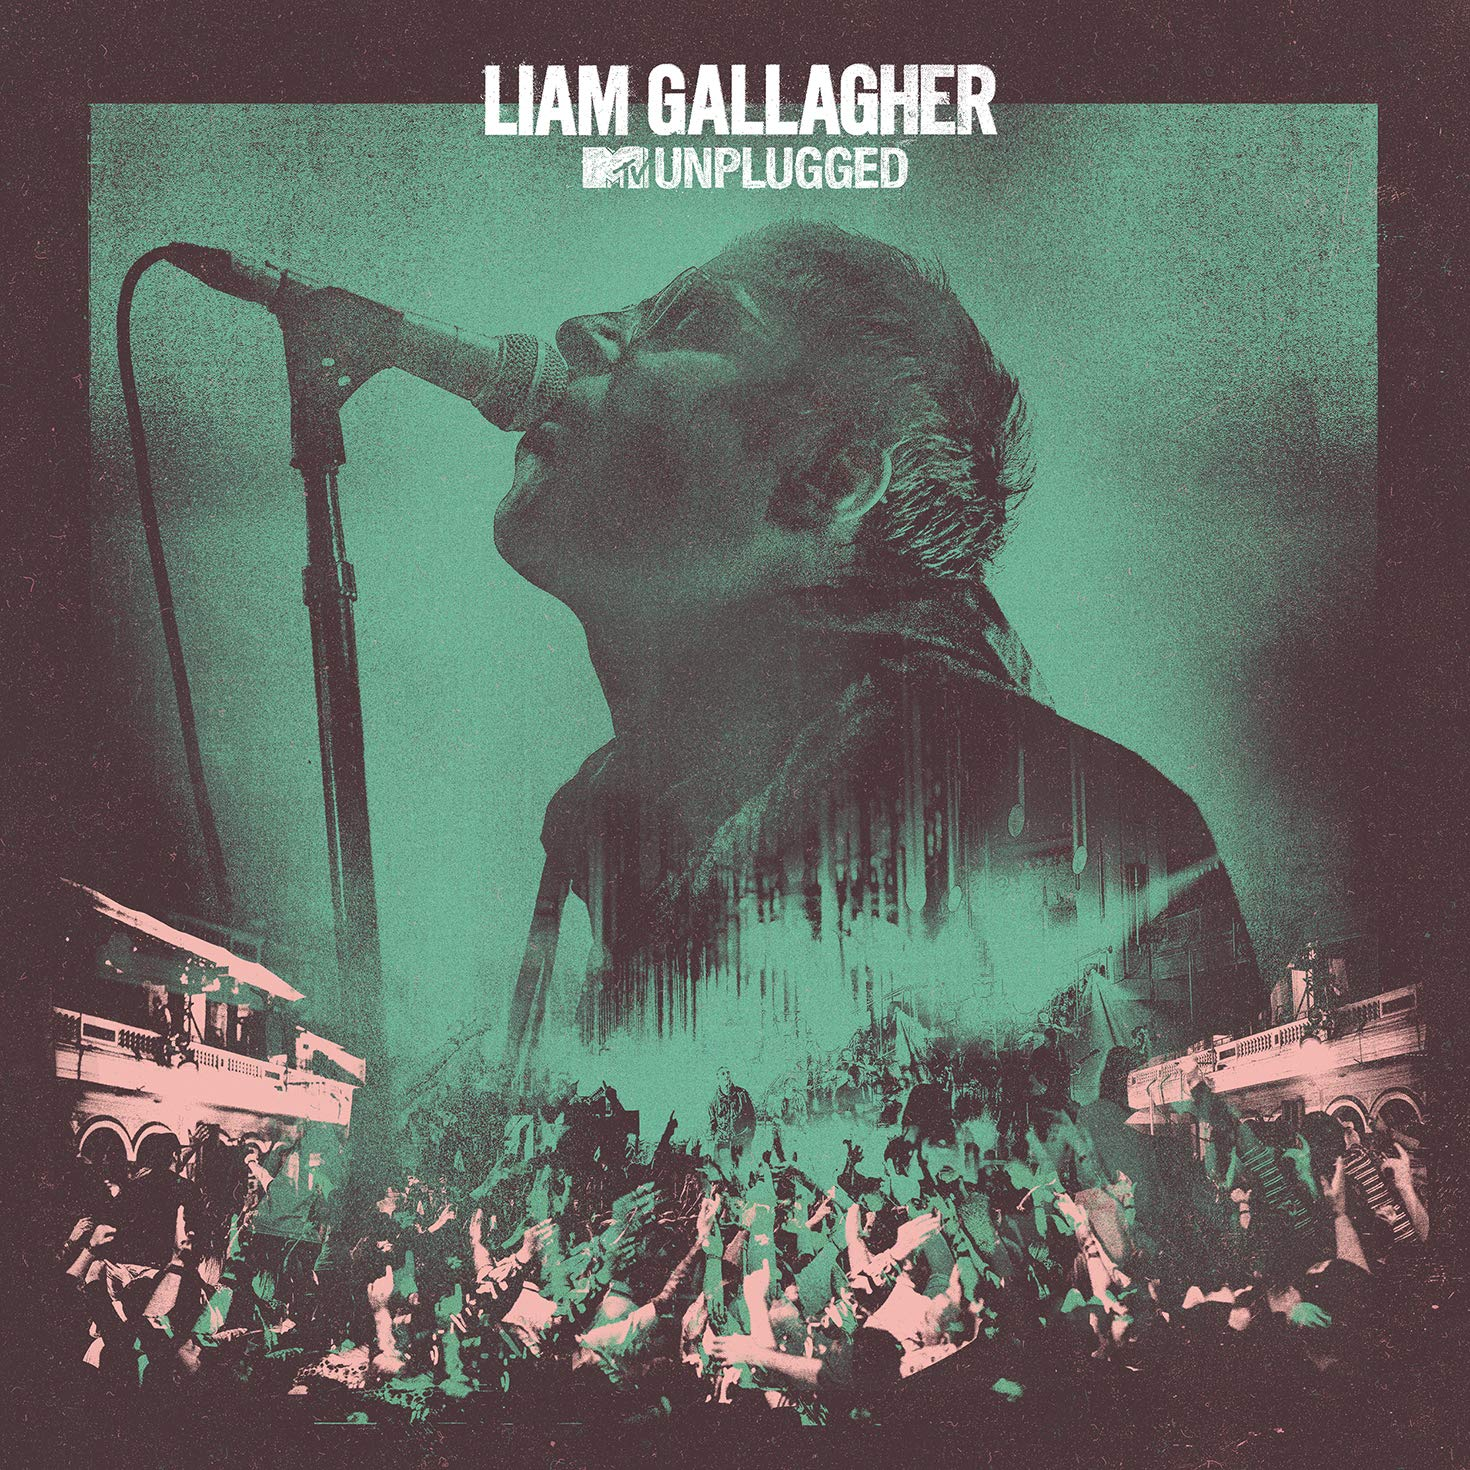 Liam Gallagher - MTV Unplugged [LP]